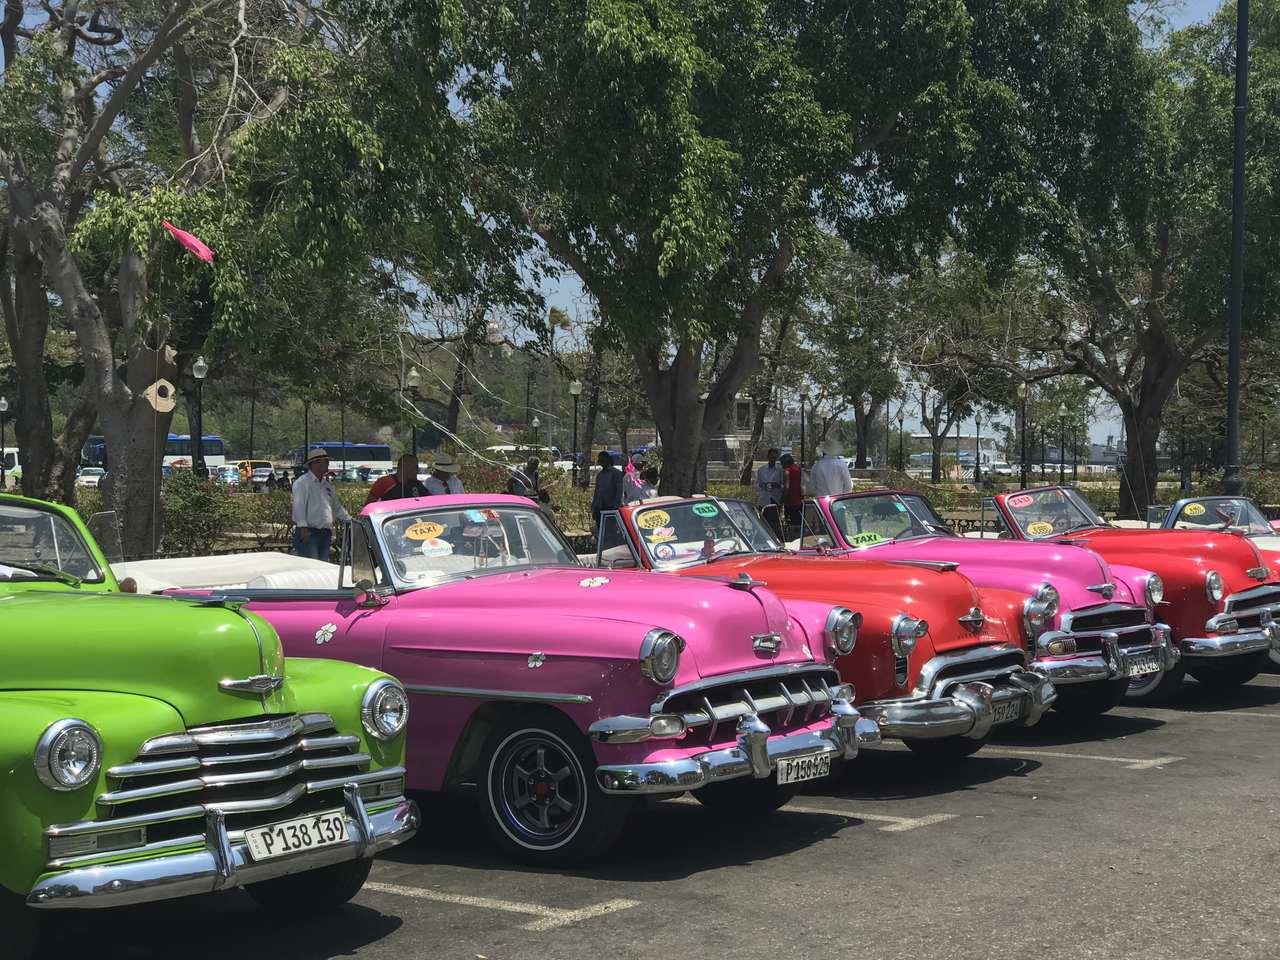 Colourful classic cars